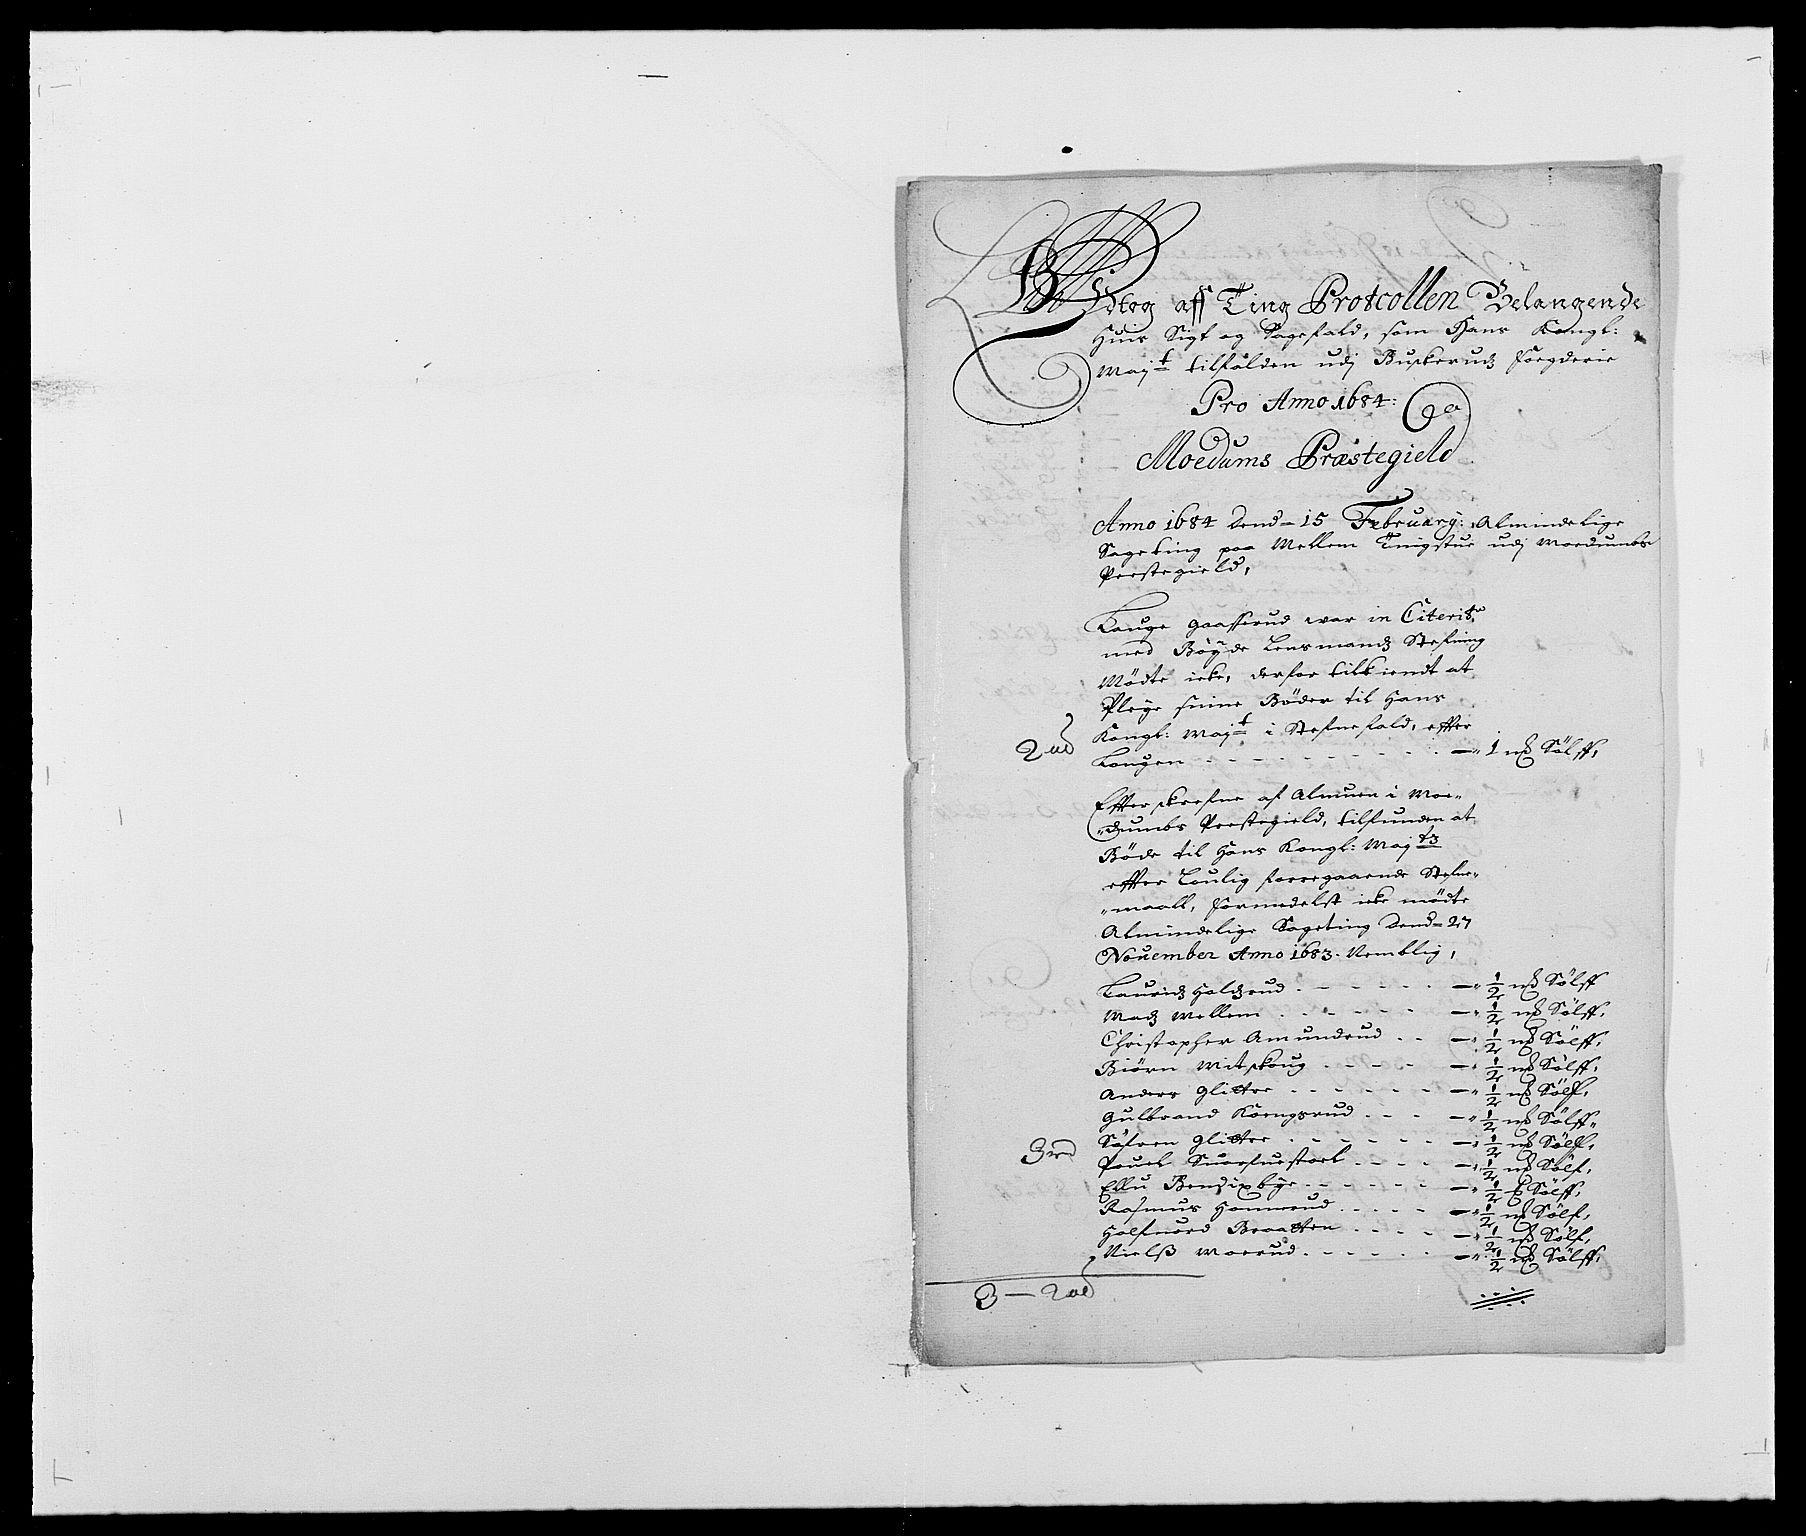 RA, Rentekammeret inntil 1814, Reviderte regnskaper, Fogderegnskap, R25/L1677: Fogderegnskap Buskerud, 1683-1684, s. 206